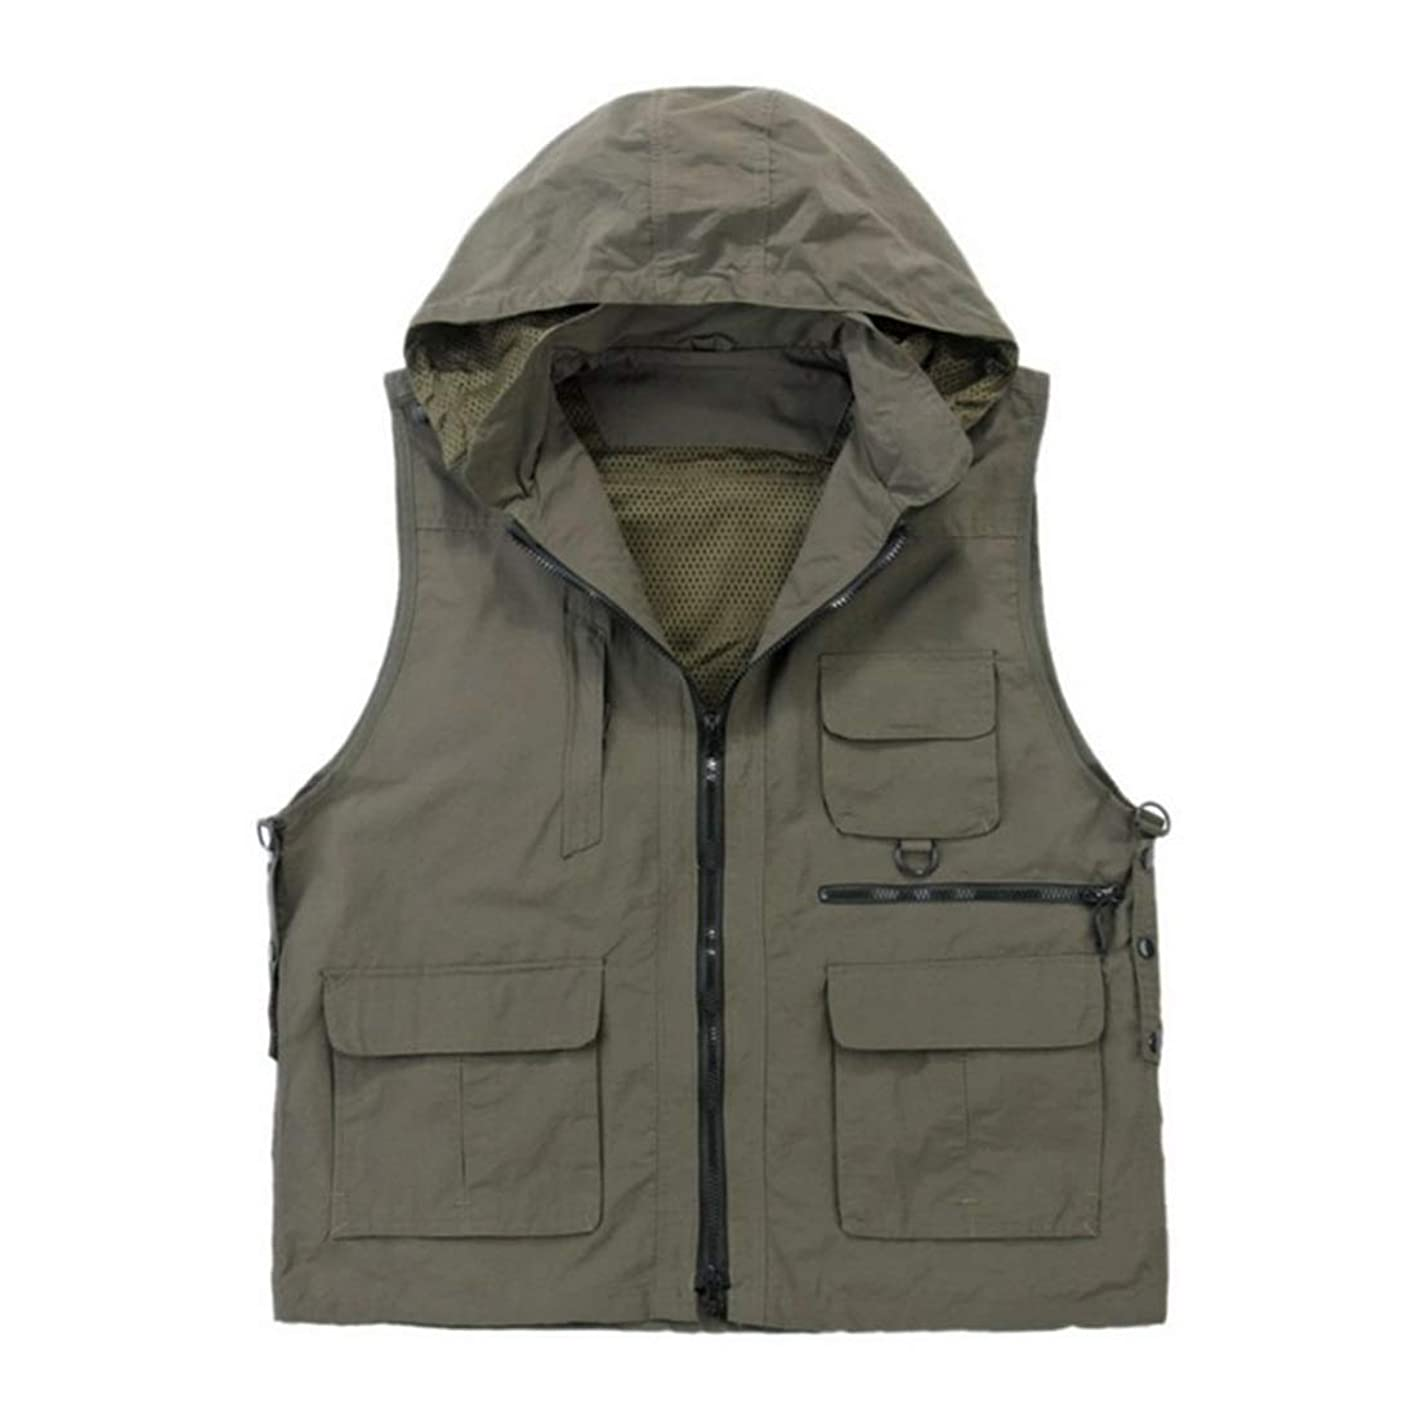 Deebling Nylon Breathable Openwork Camouflage Journalist Photographer Fishing Vest Waistcoat Jacket Coat hrdspwxjaxr840